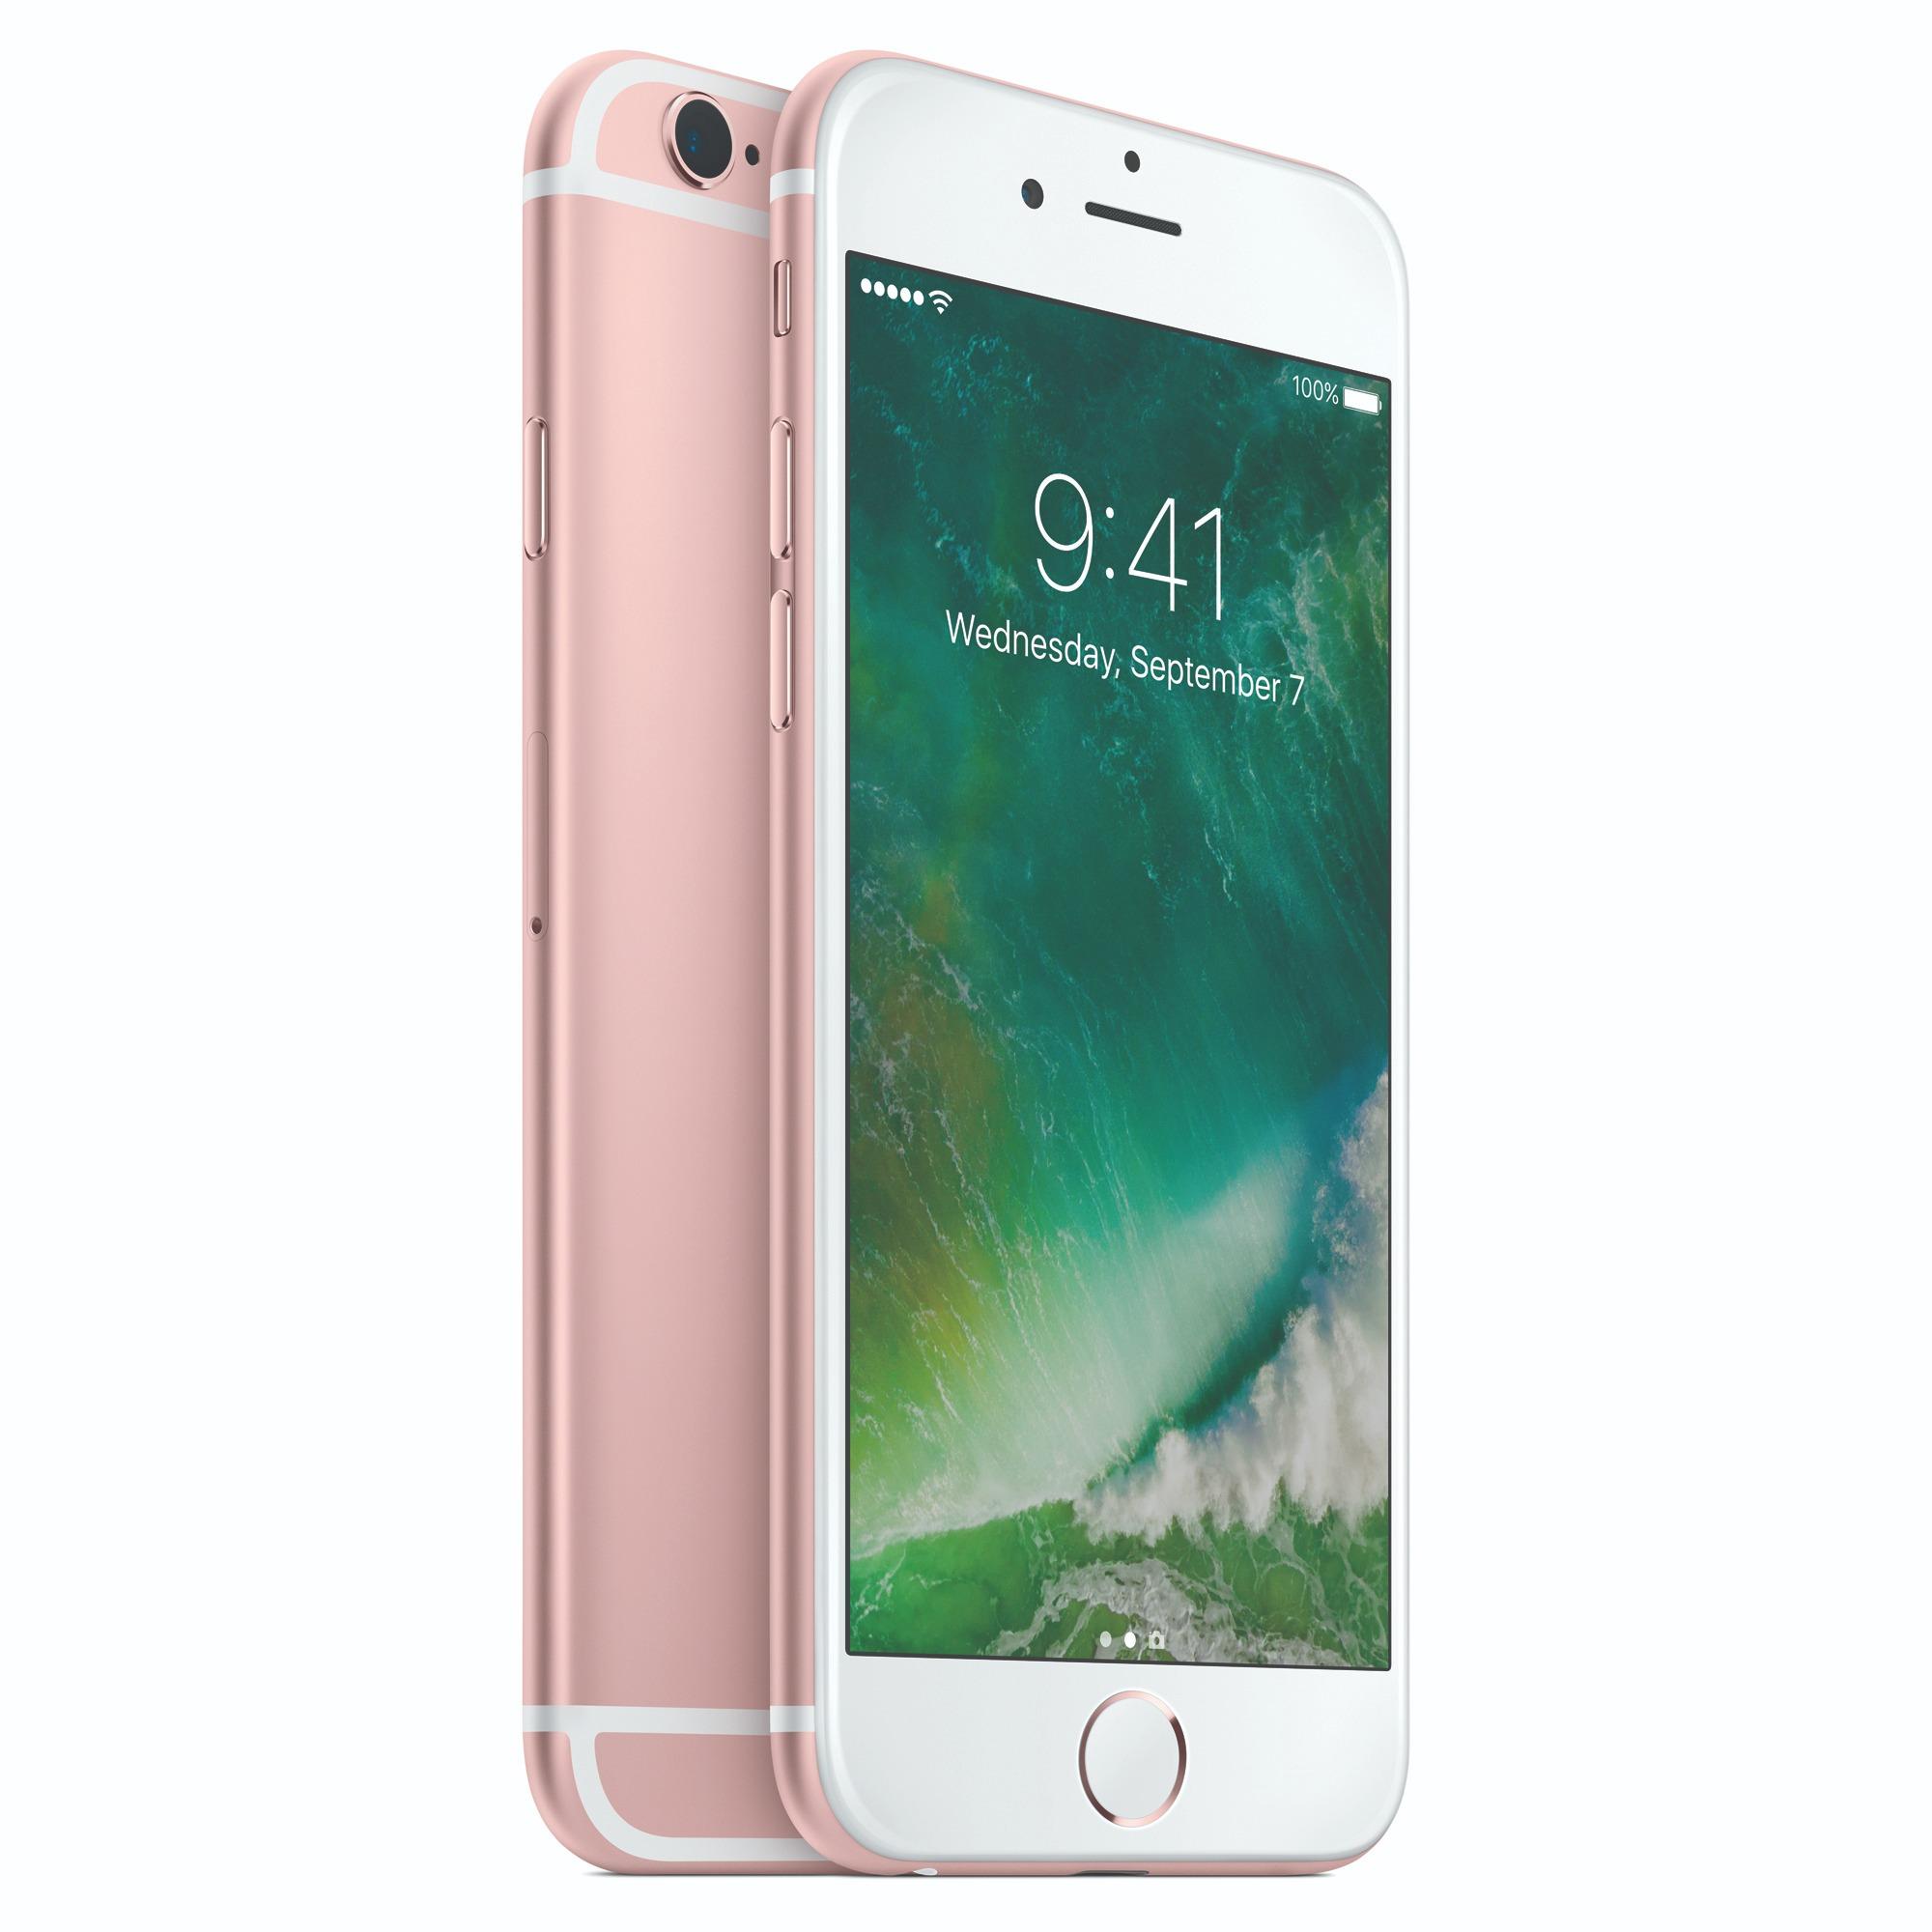 Net10 Apple iPhone 6s 32GB Prepaid Smartphone, Rose Gold Item